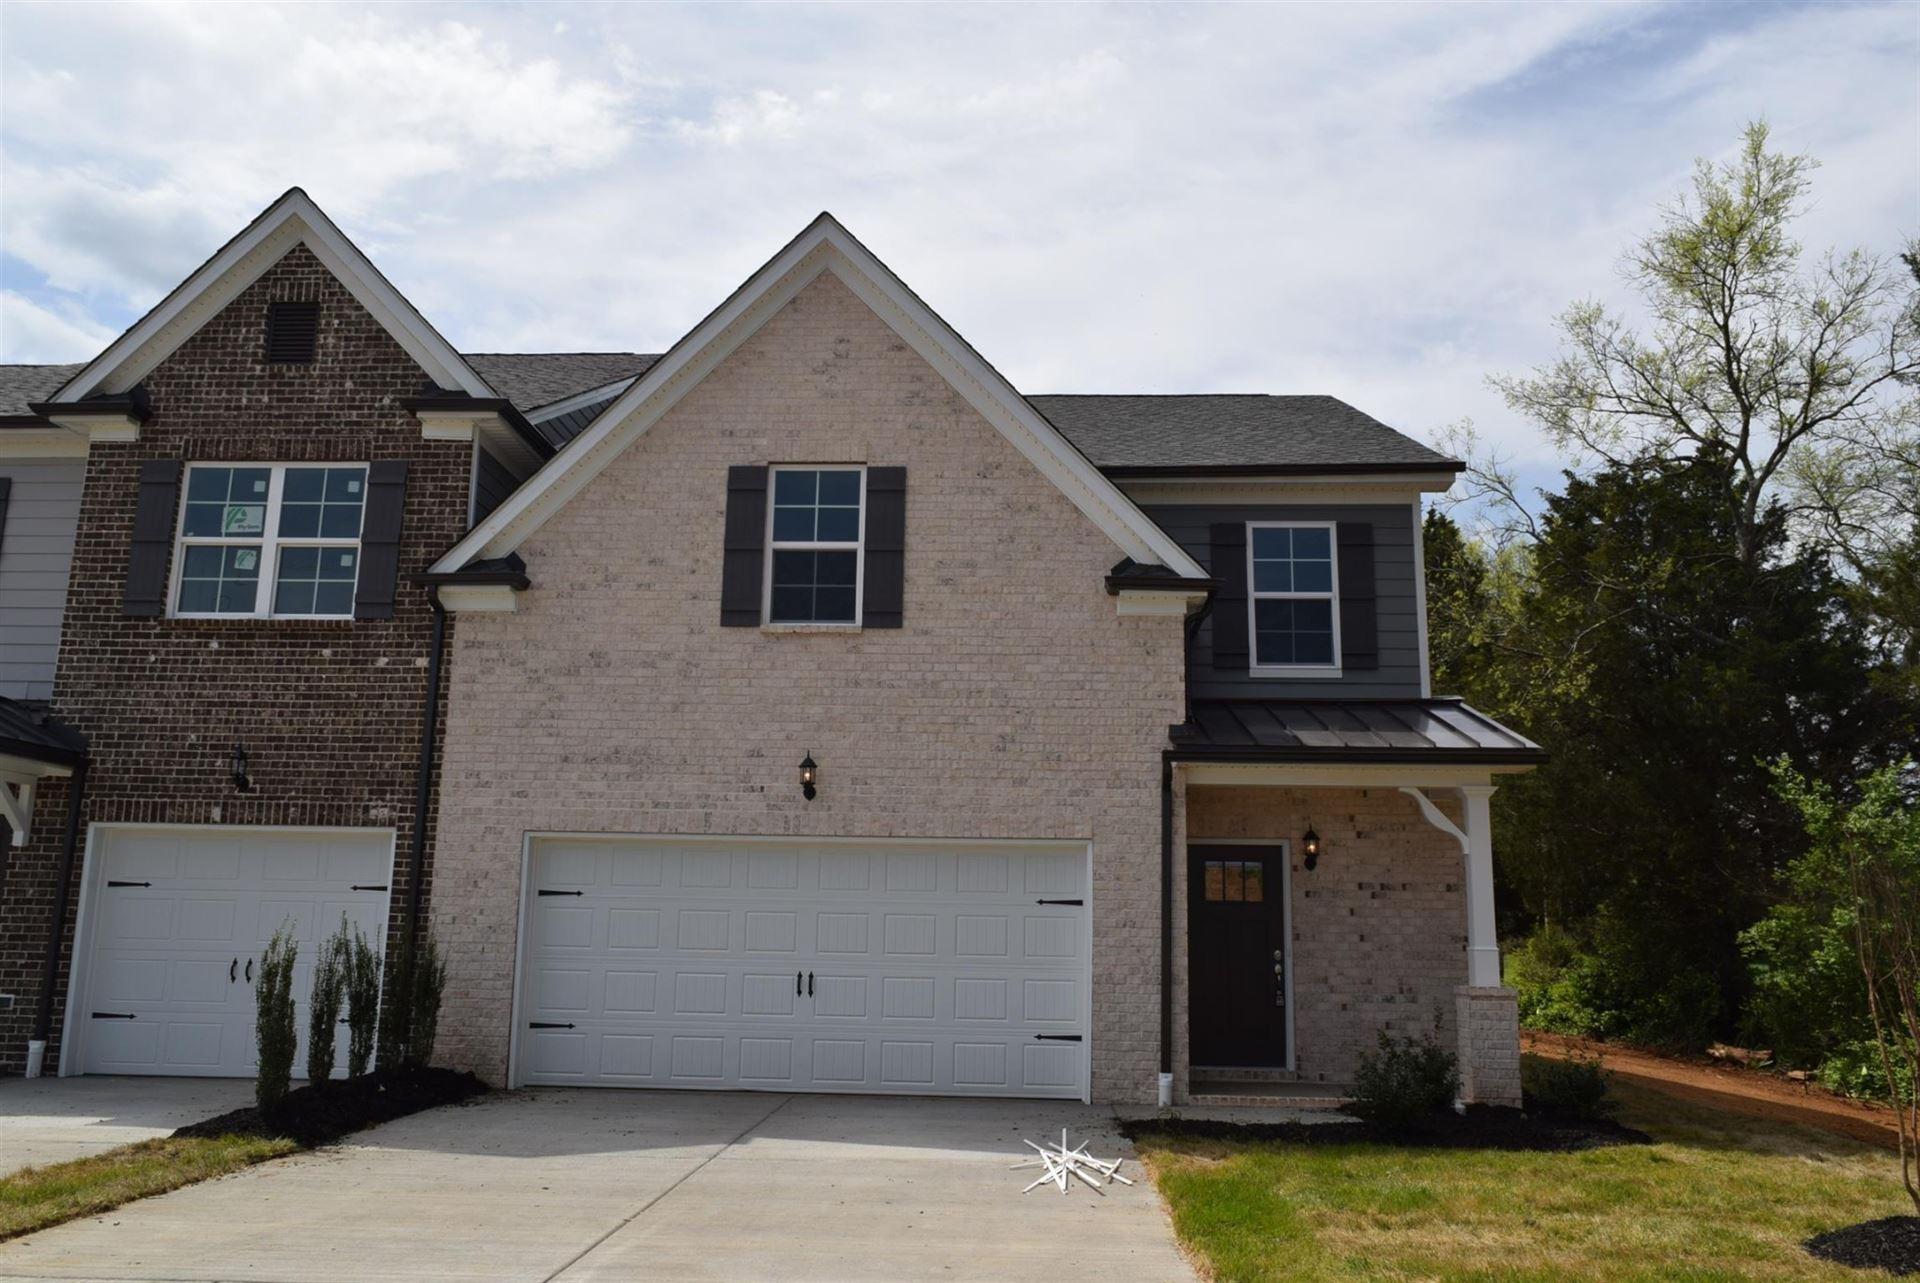 4415 Chusto Drive, Murfreesboro, TN 37129 - MLS#: 2205656